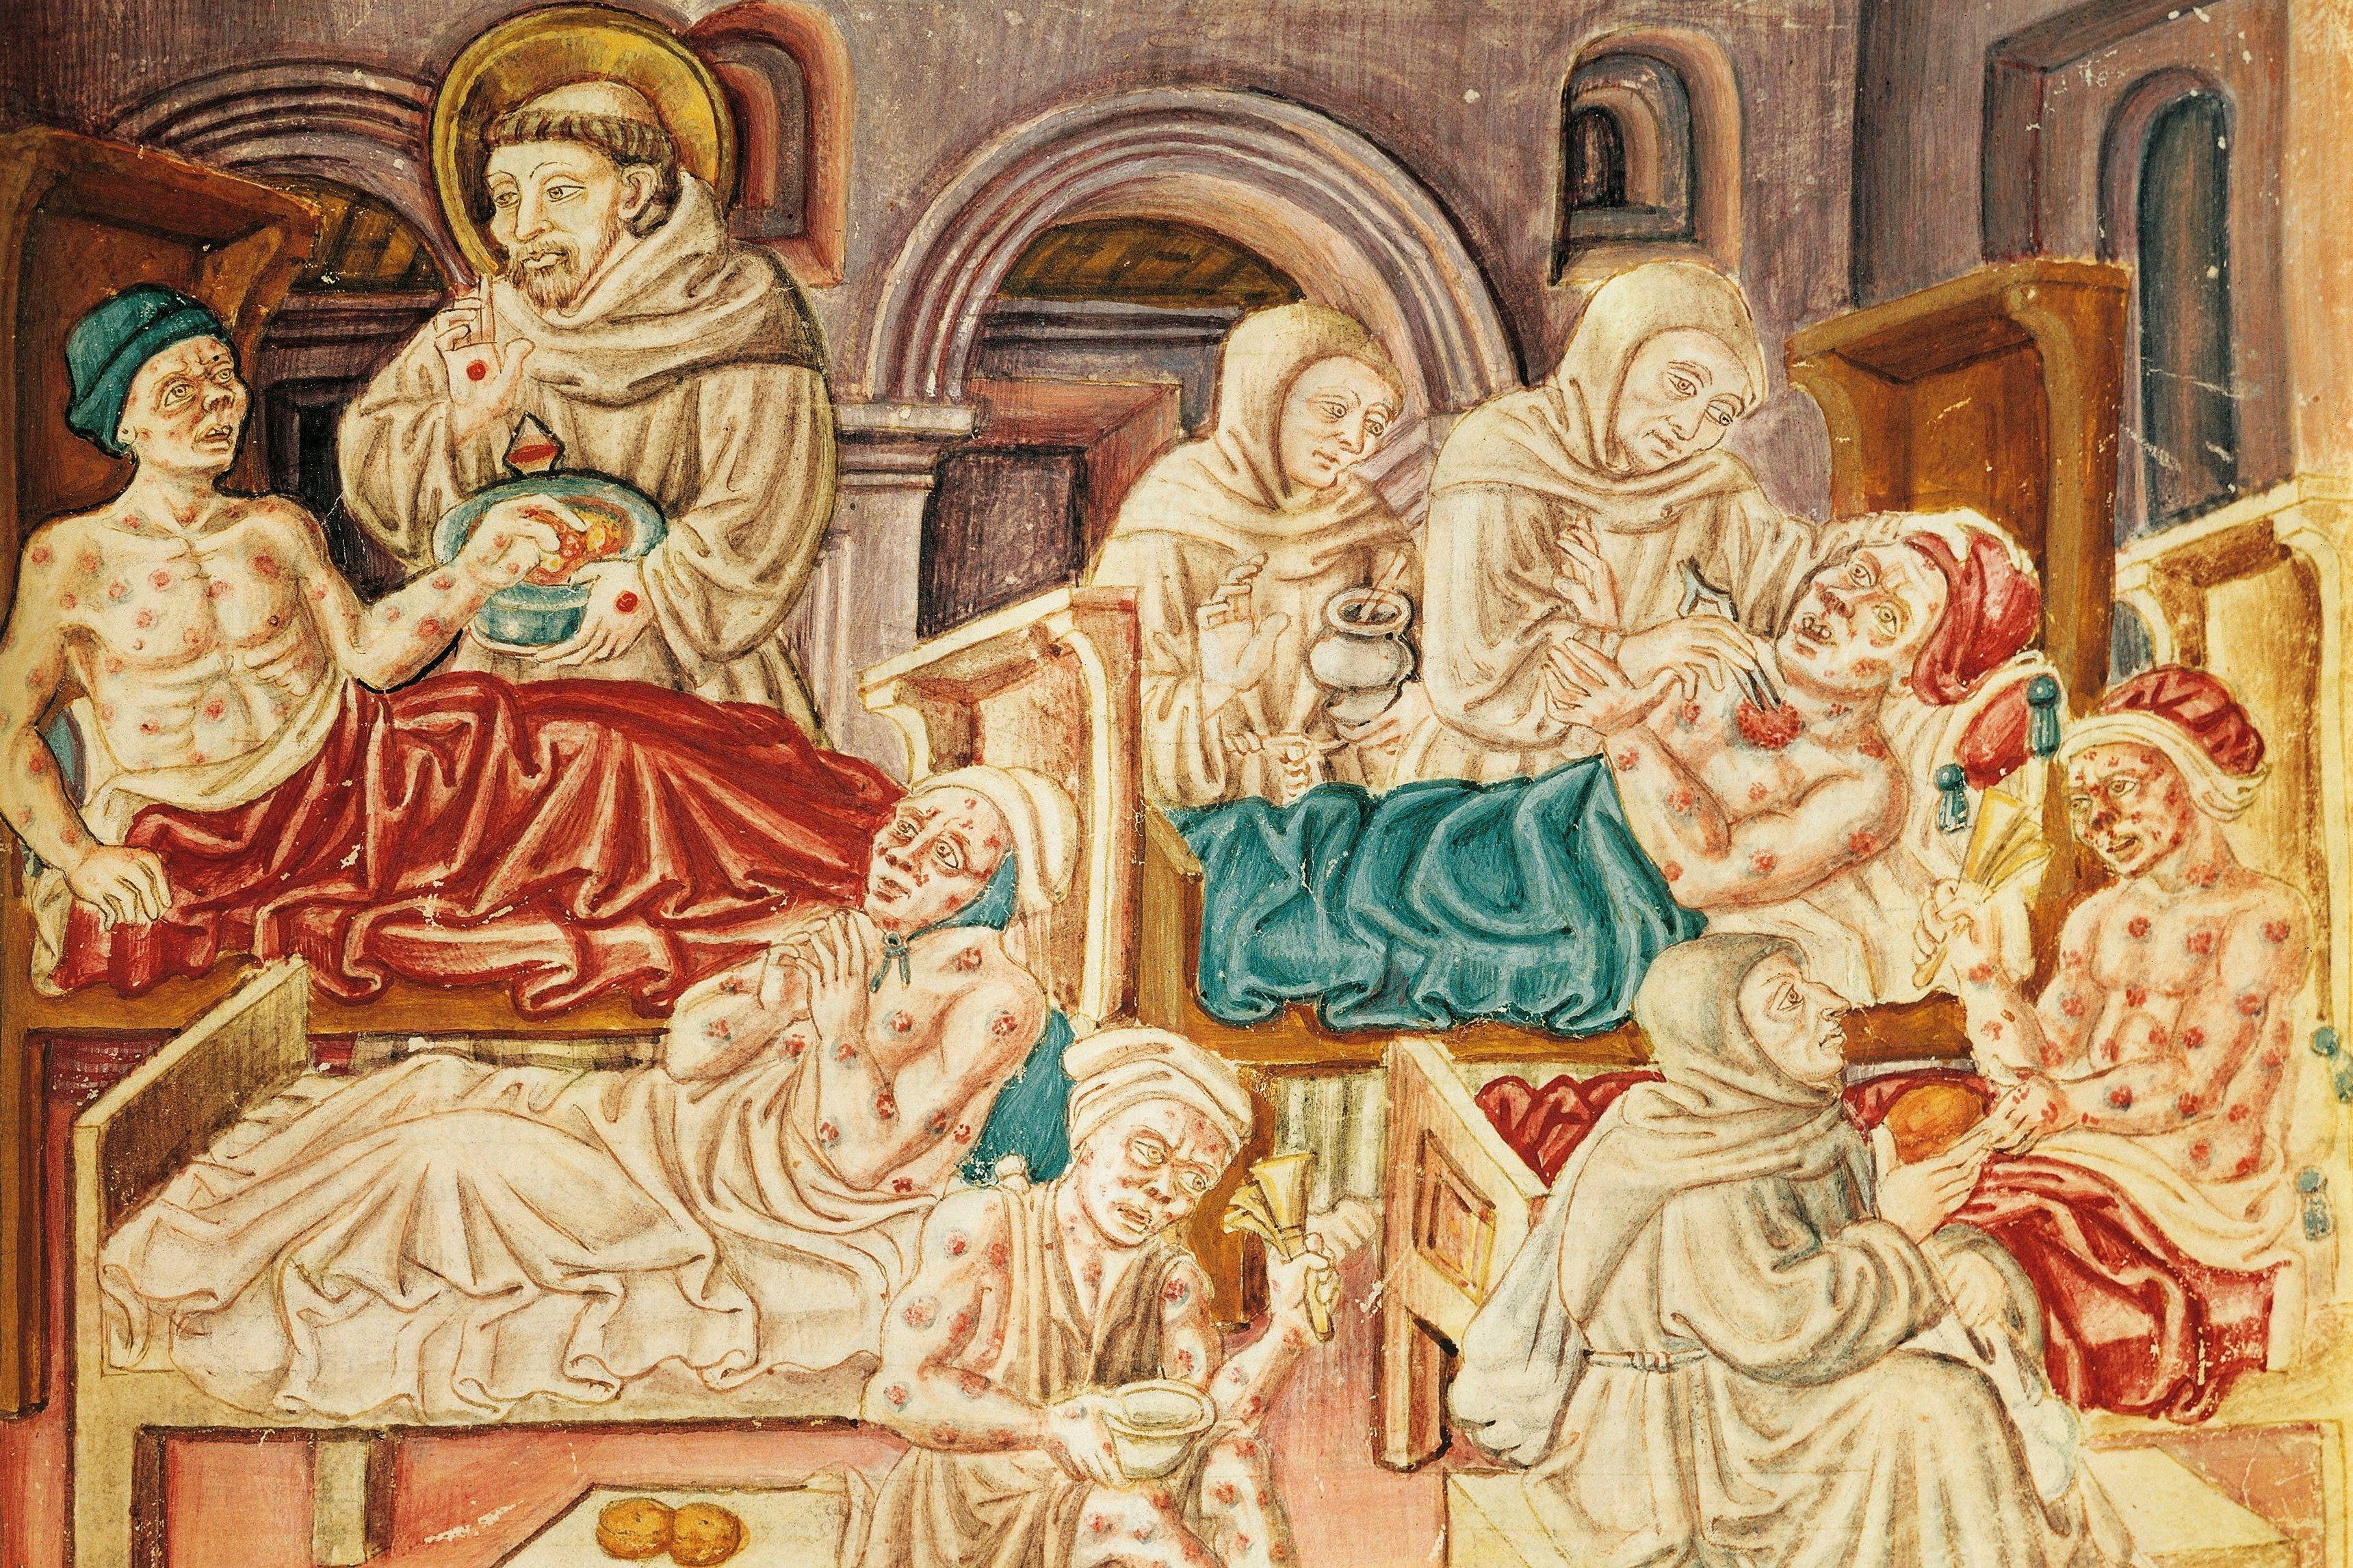 The Franciscans treating victims of the plague, miniature from La Franceschina, ca 1474, codex by Jacopo Oddi (15th century). Italy, 15th century.